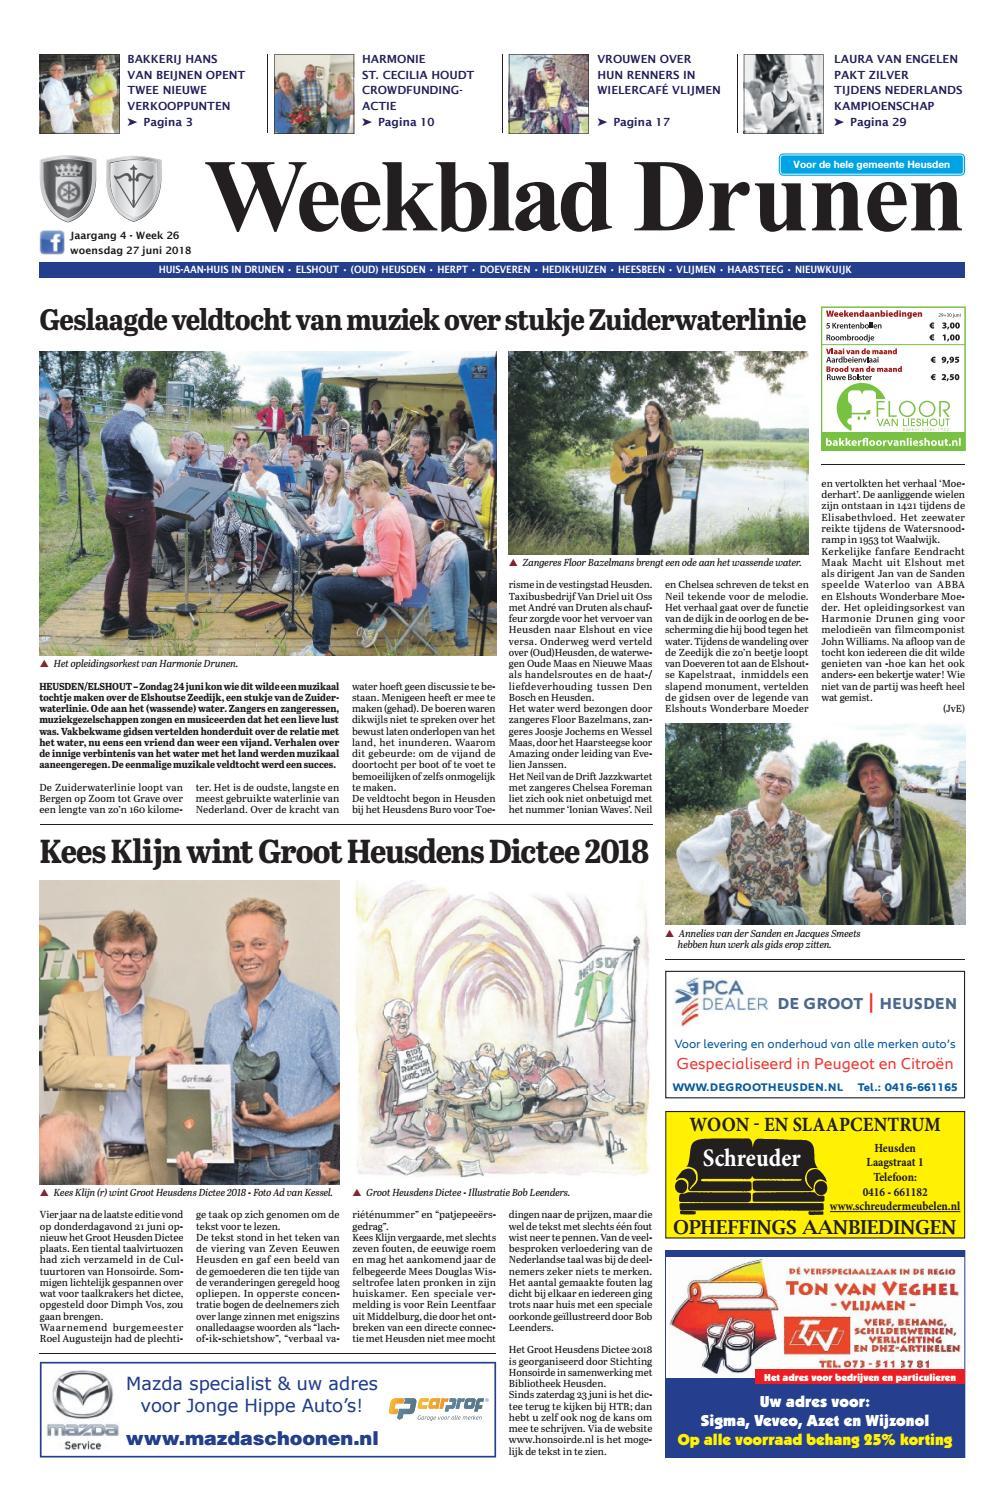 780ab1d9102 Weekblad Drunen 27-06-2018 by Uitgeverij Em de Jong - issuu